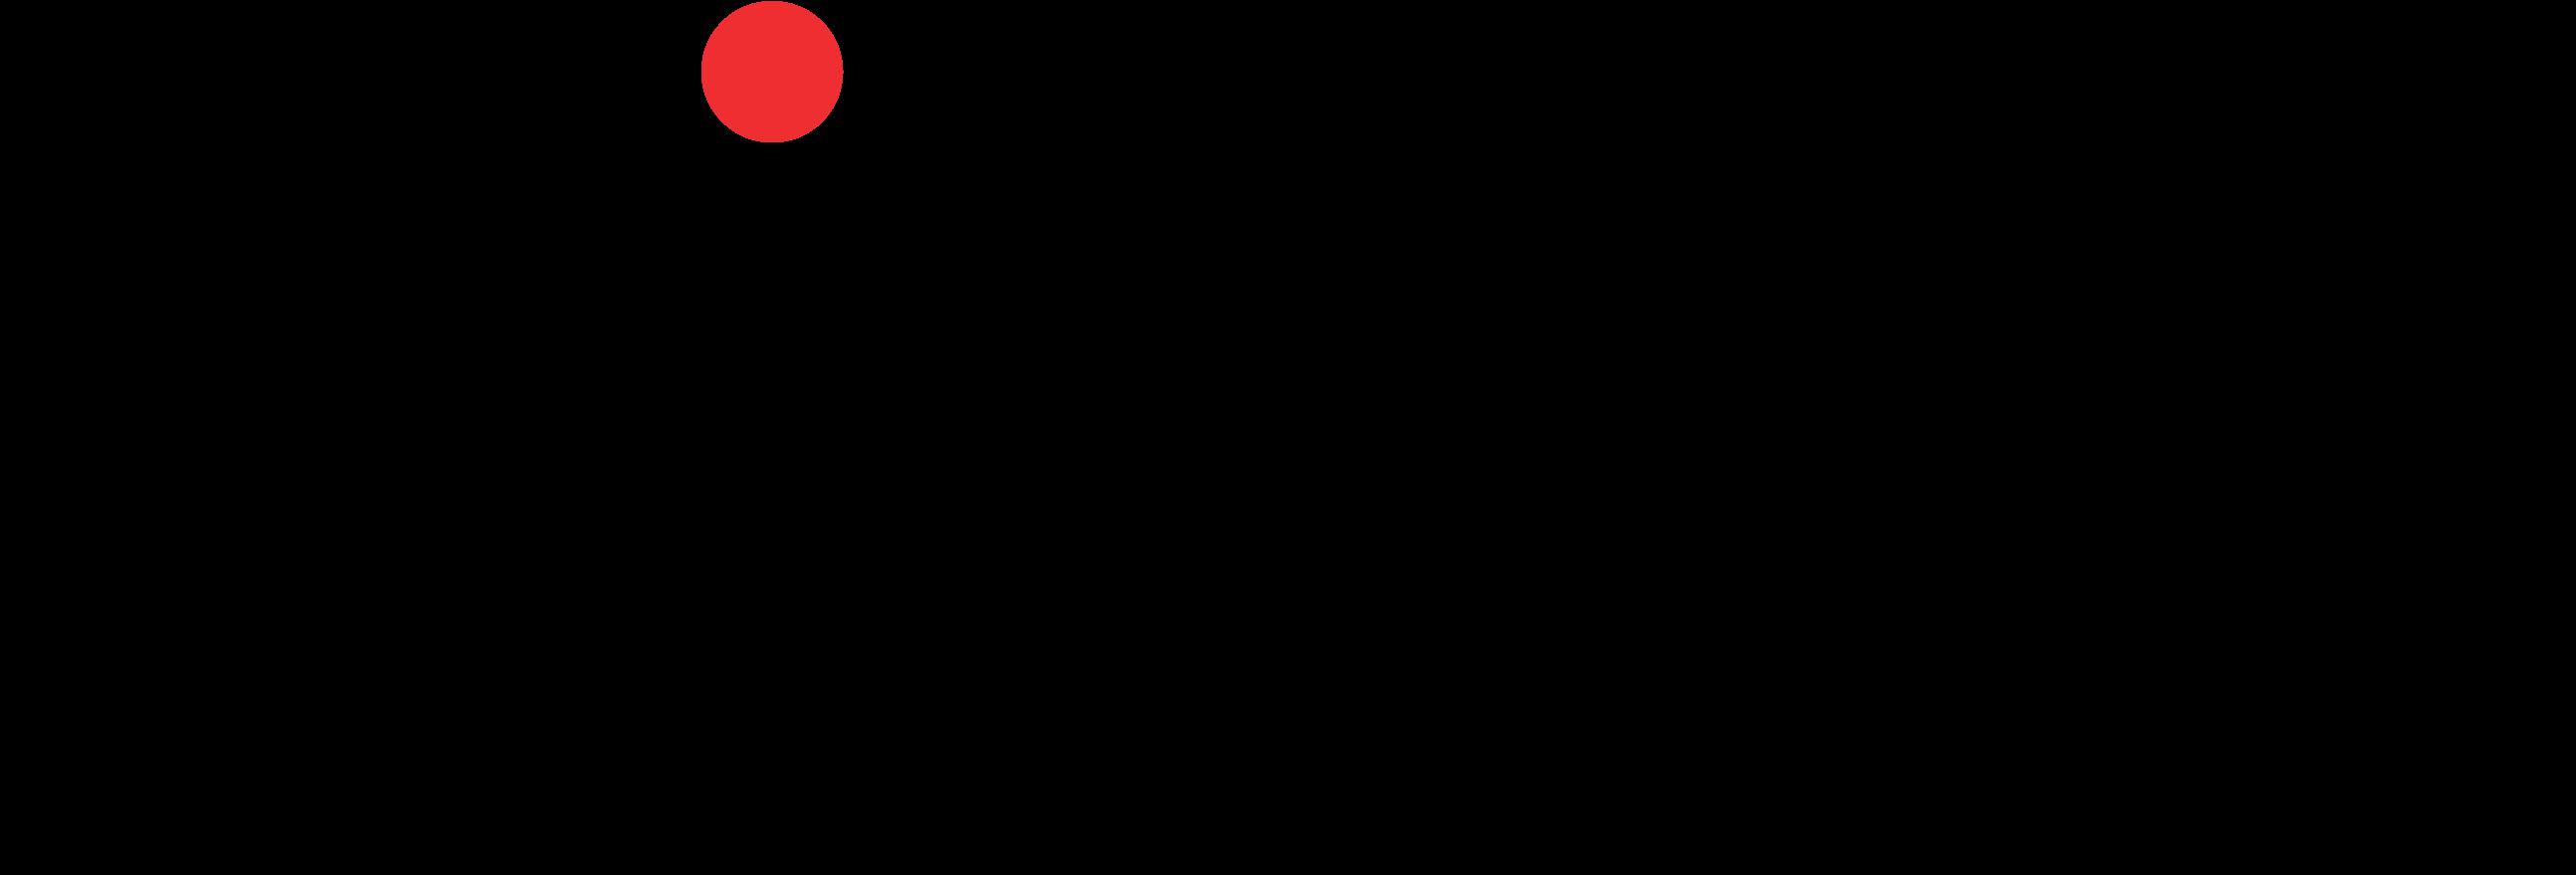 download lenovo logo lenovo thinkpad png image with no background pngkey com lenovo logo lenovo thinkpad png